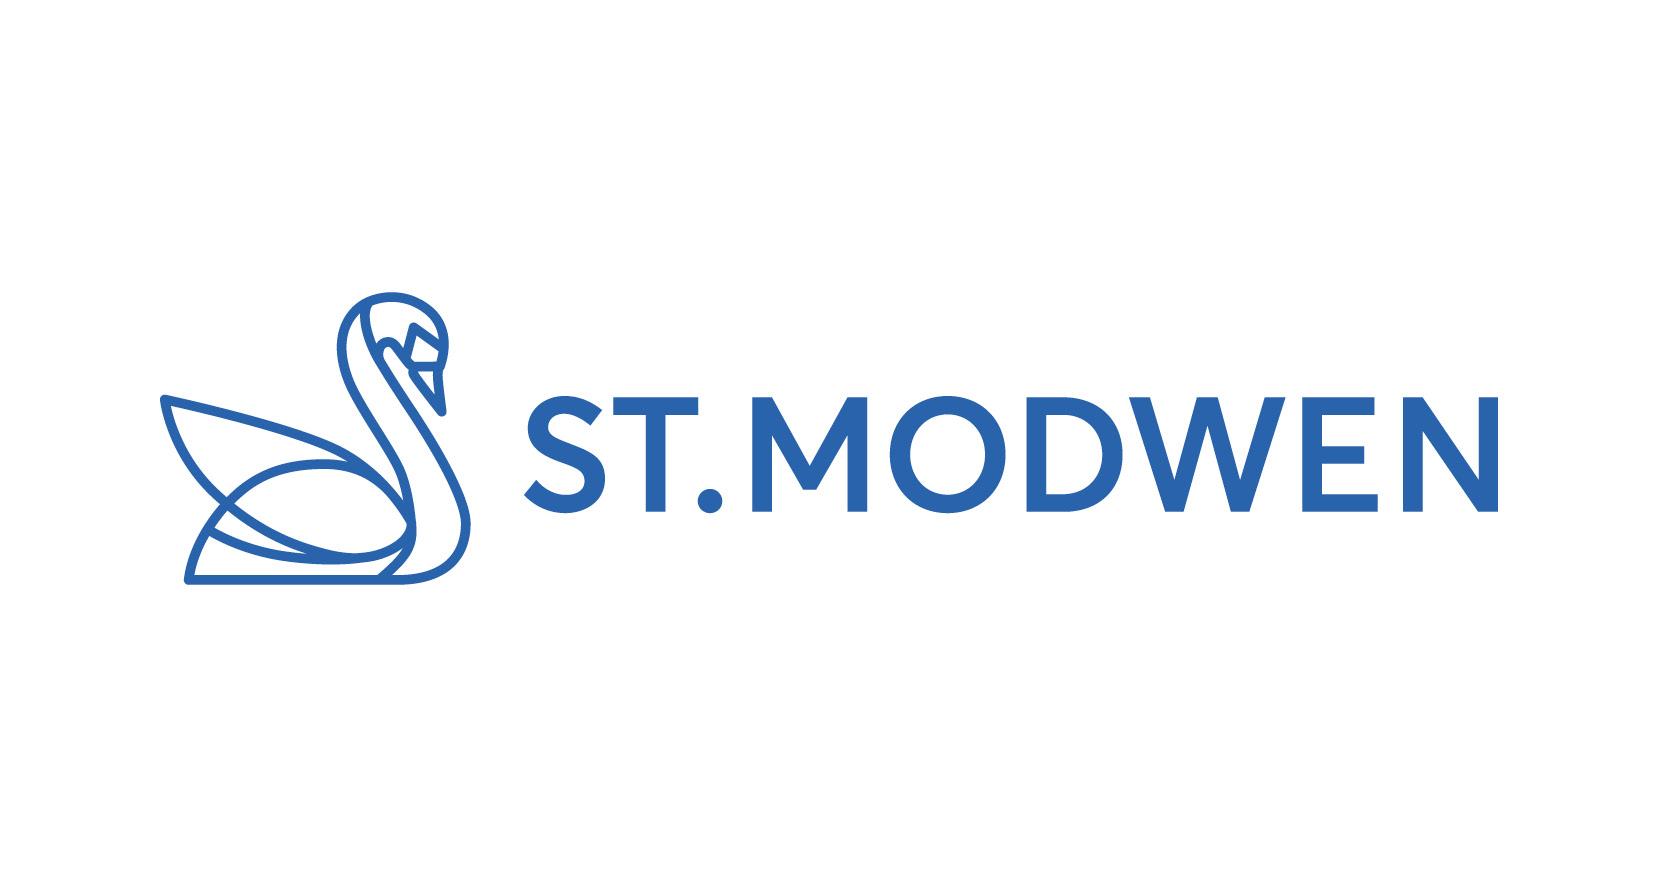 St. Modwen